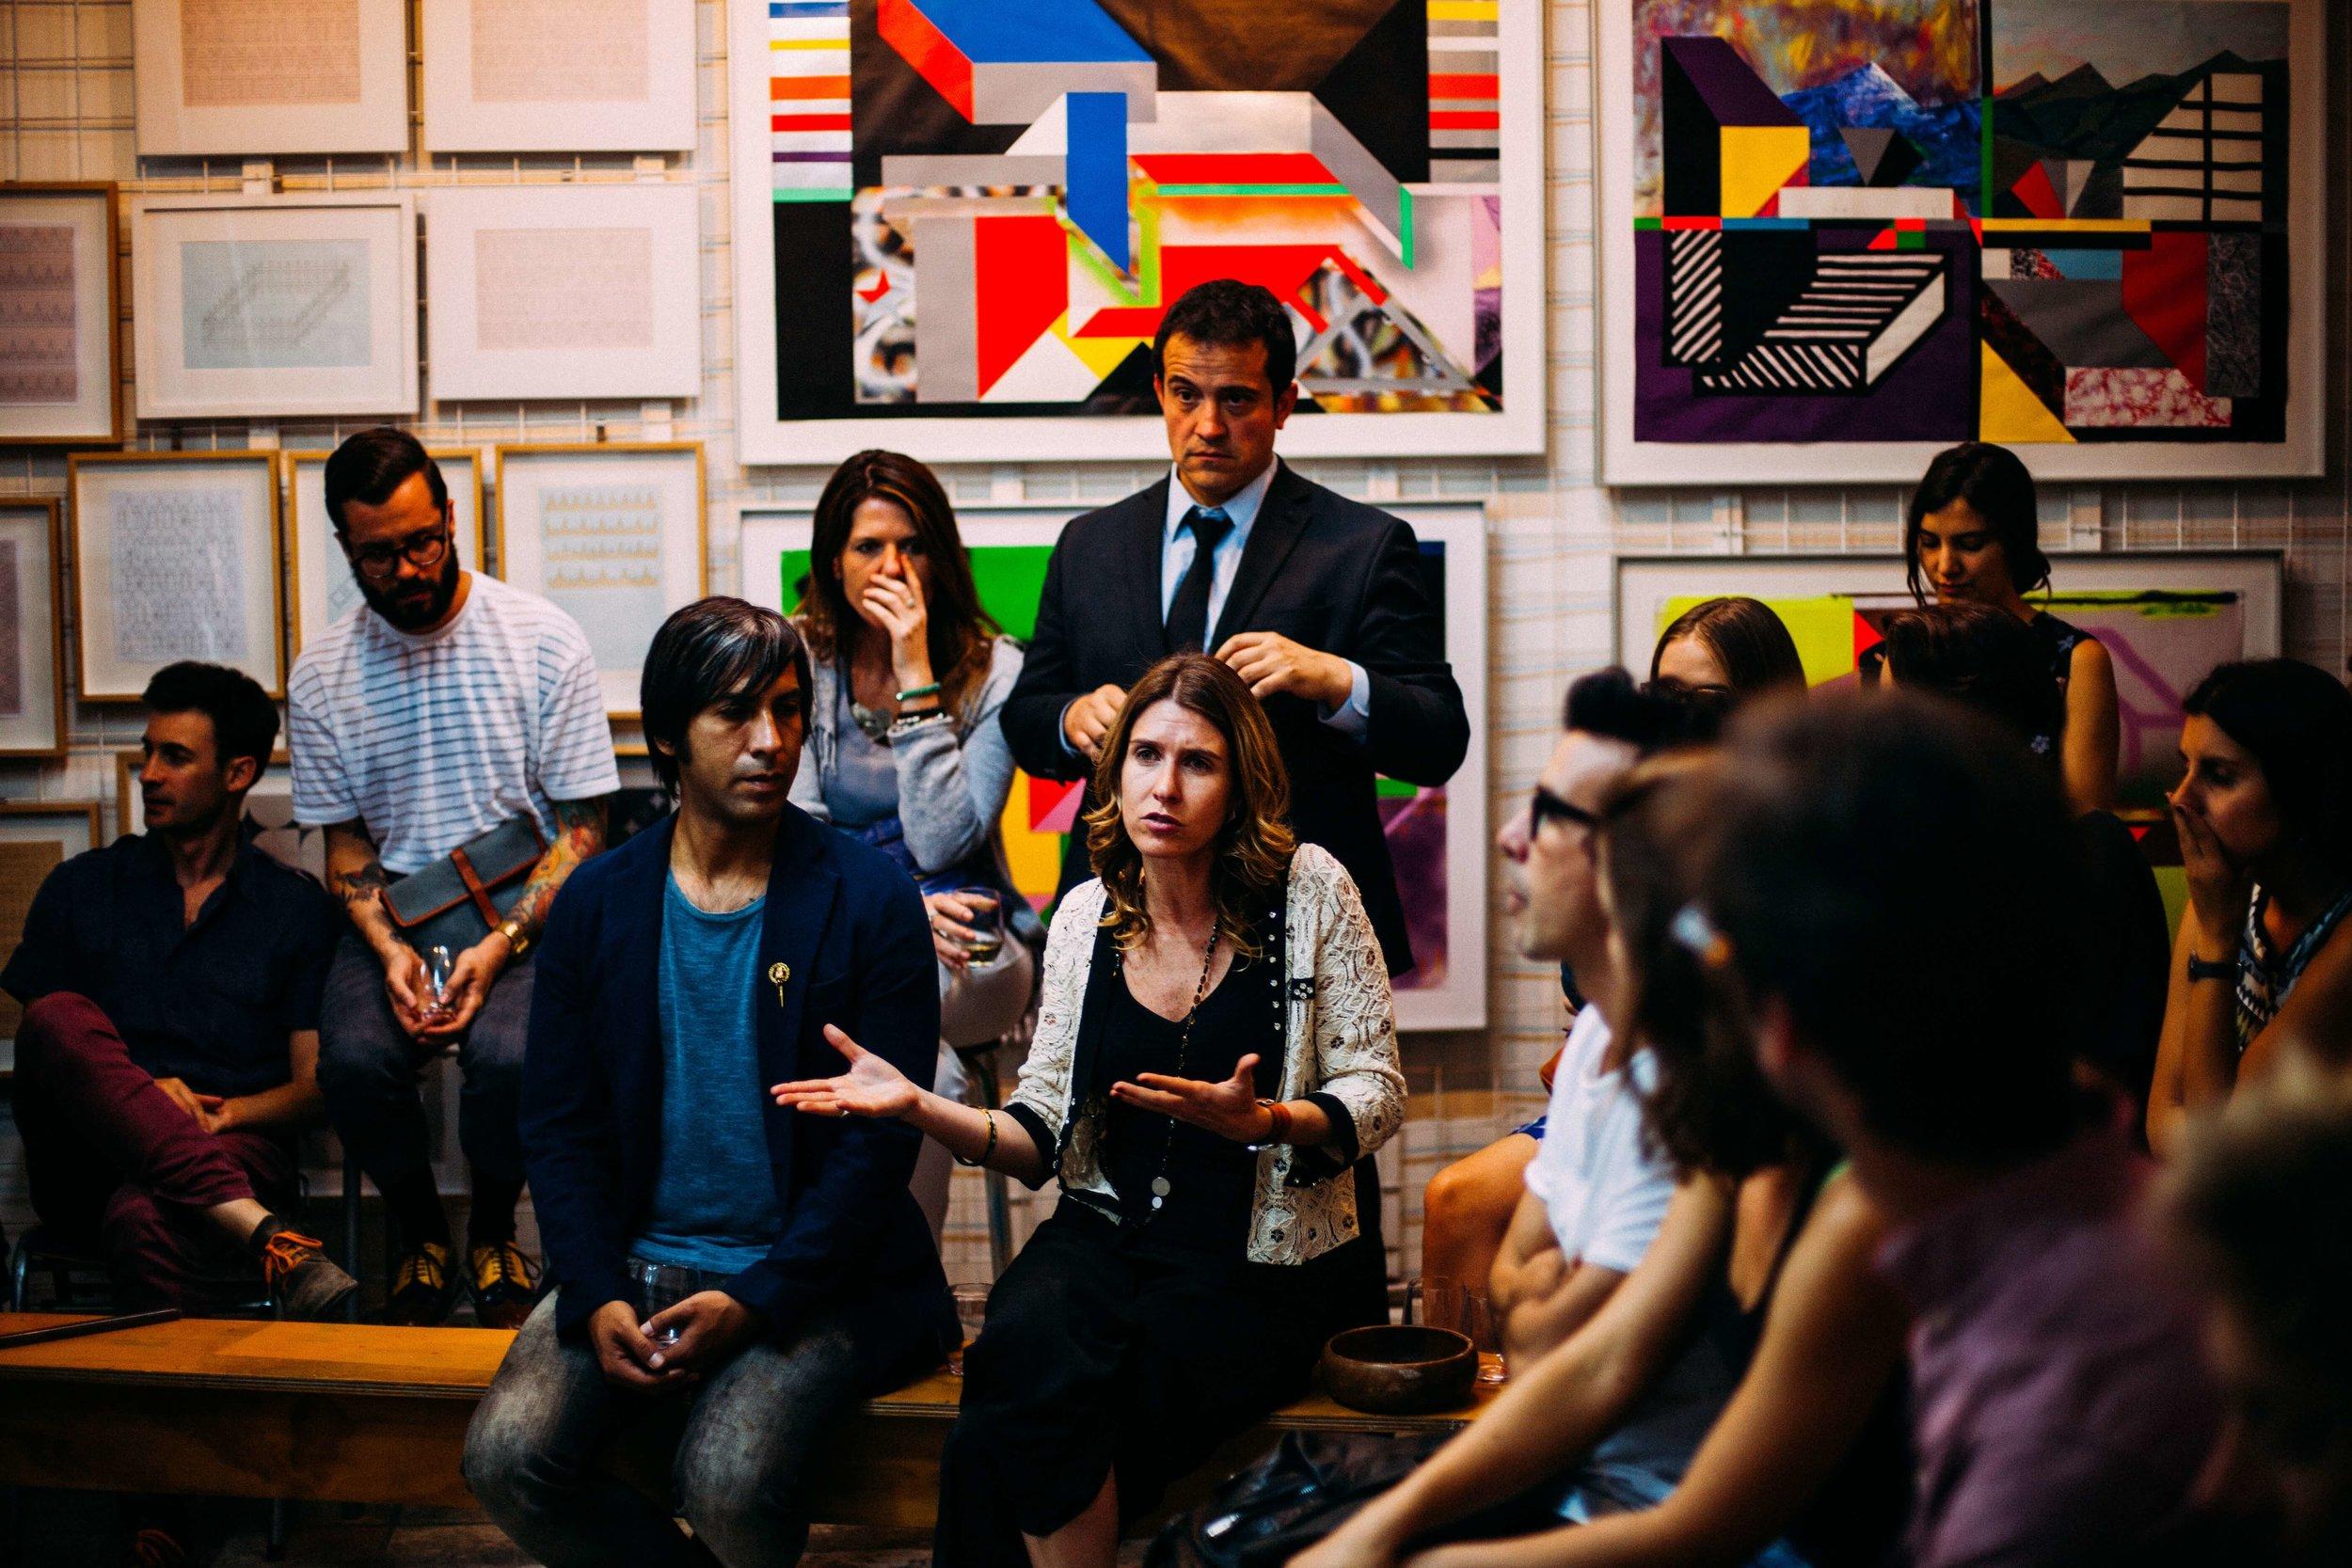 Facilitation , group discussion, diversity